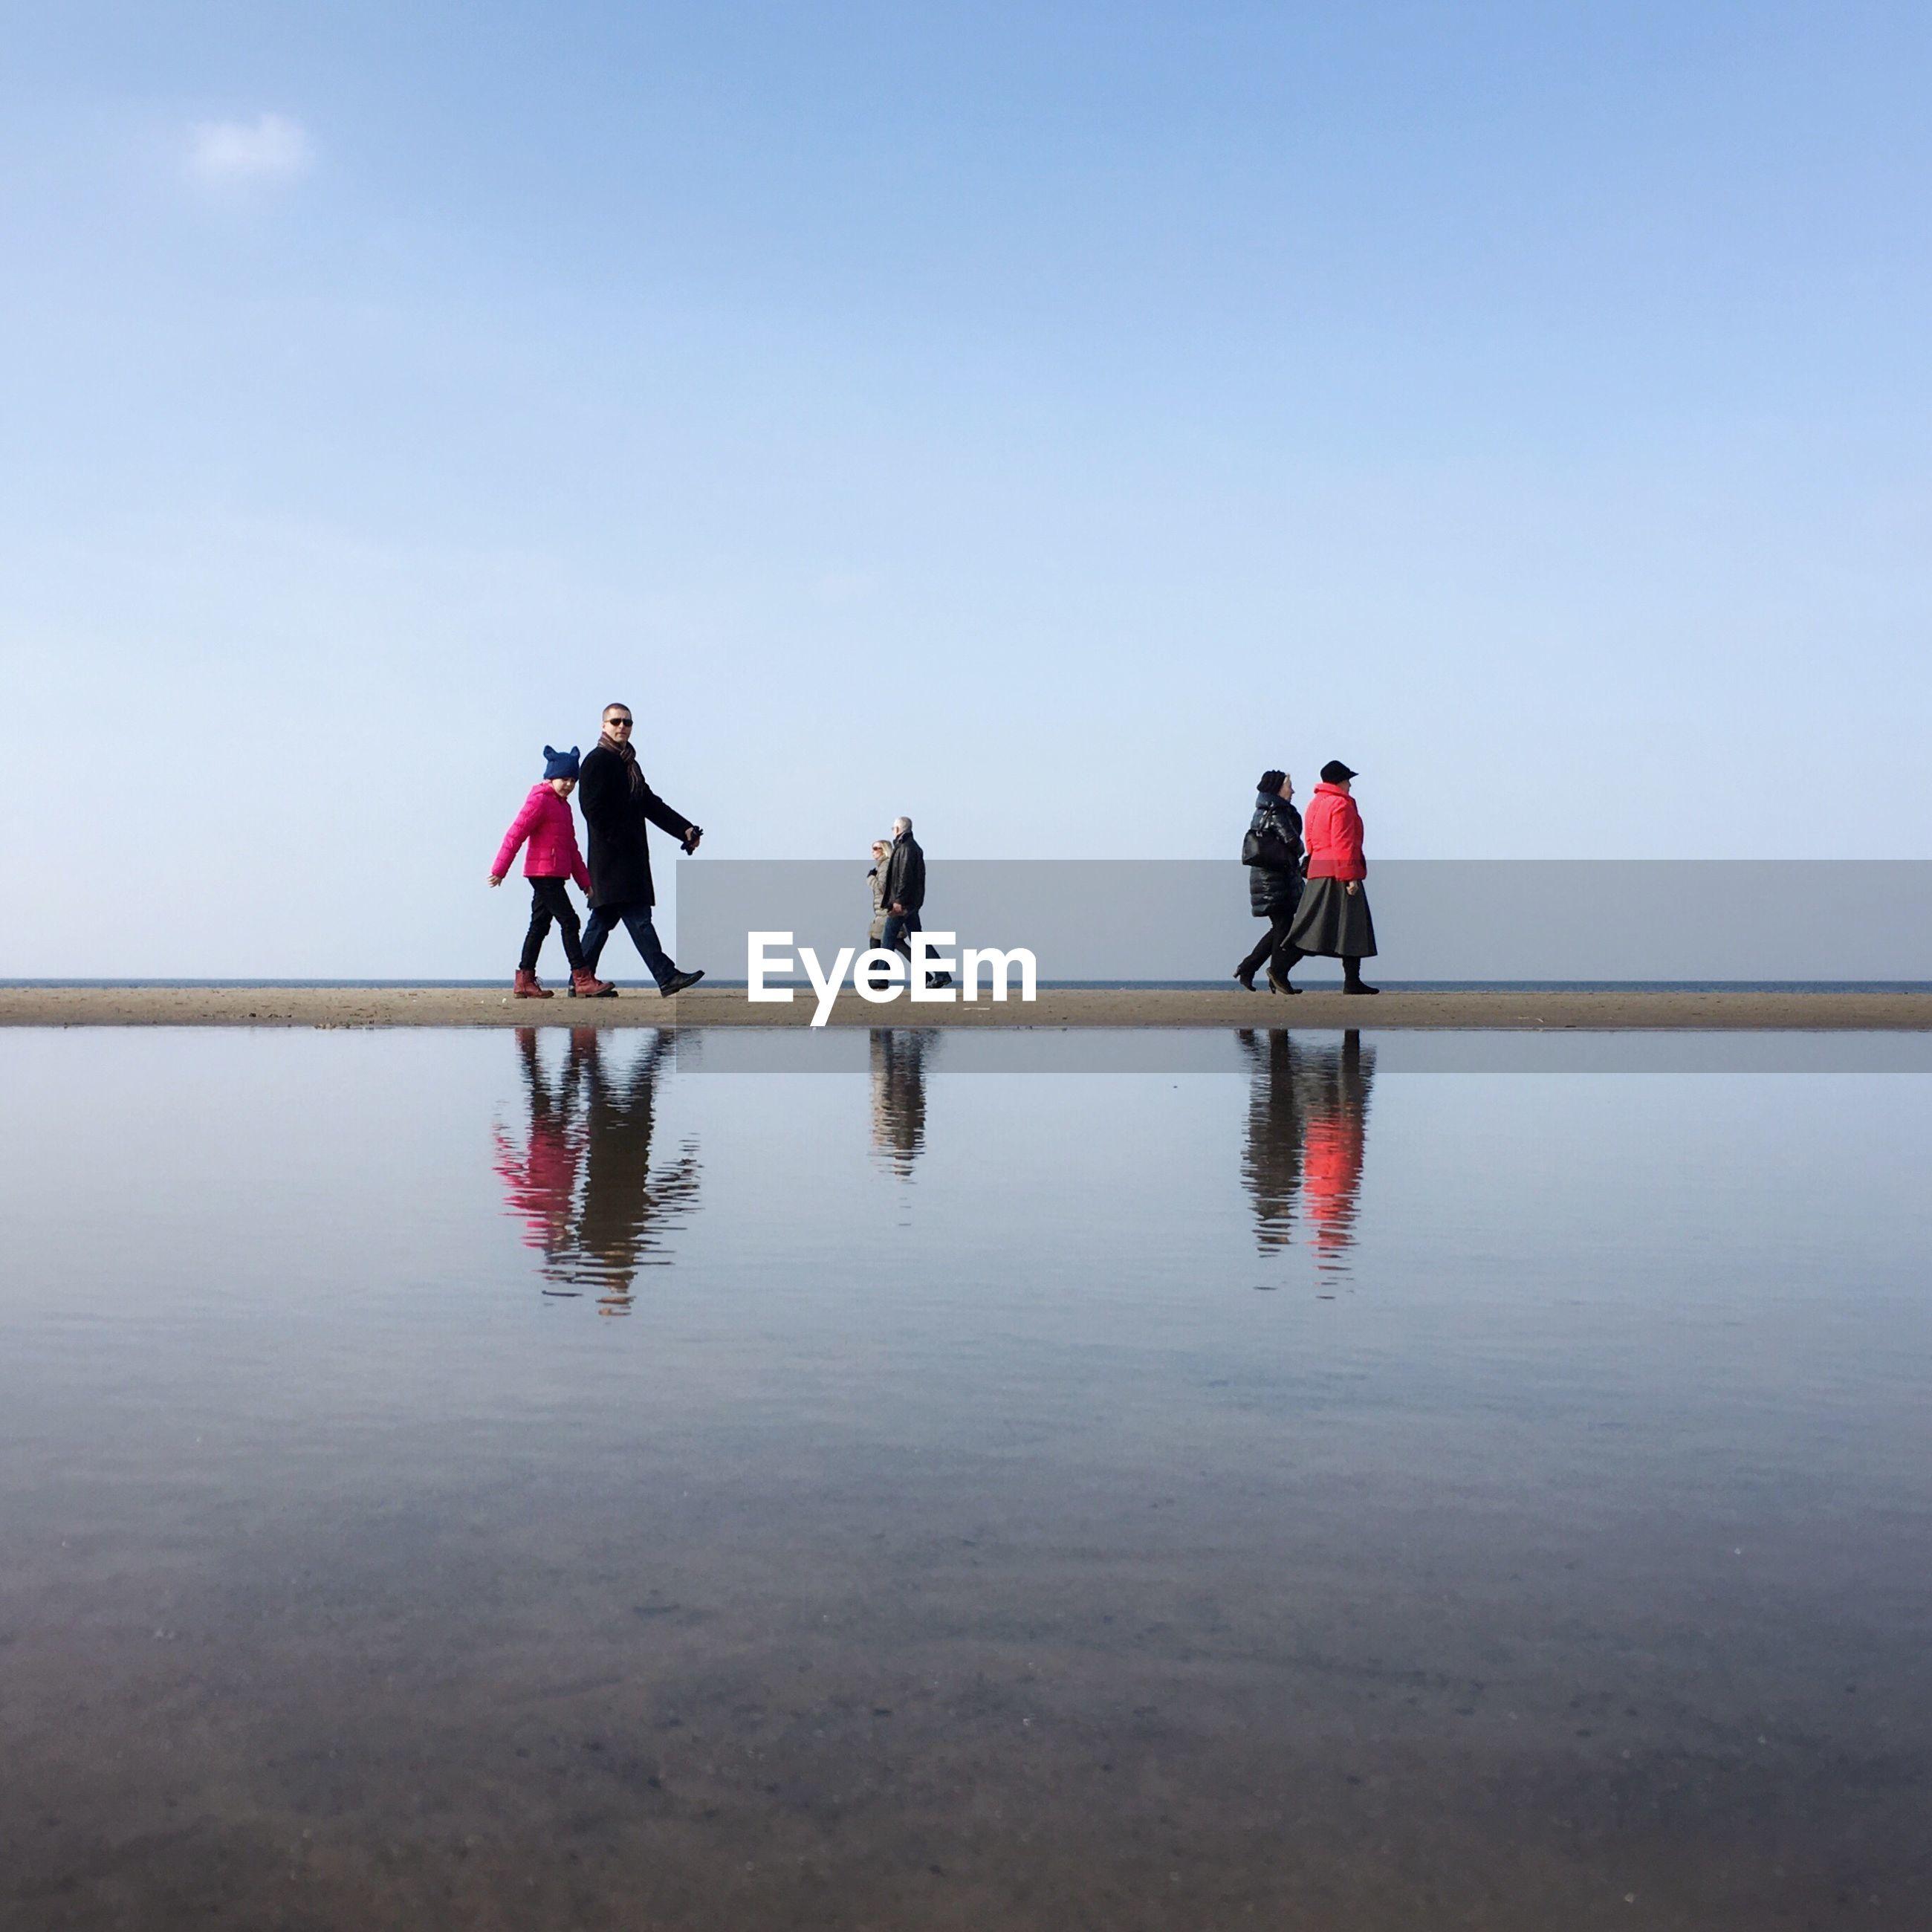 People in water